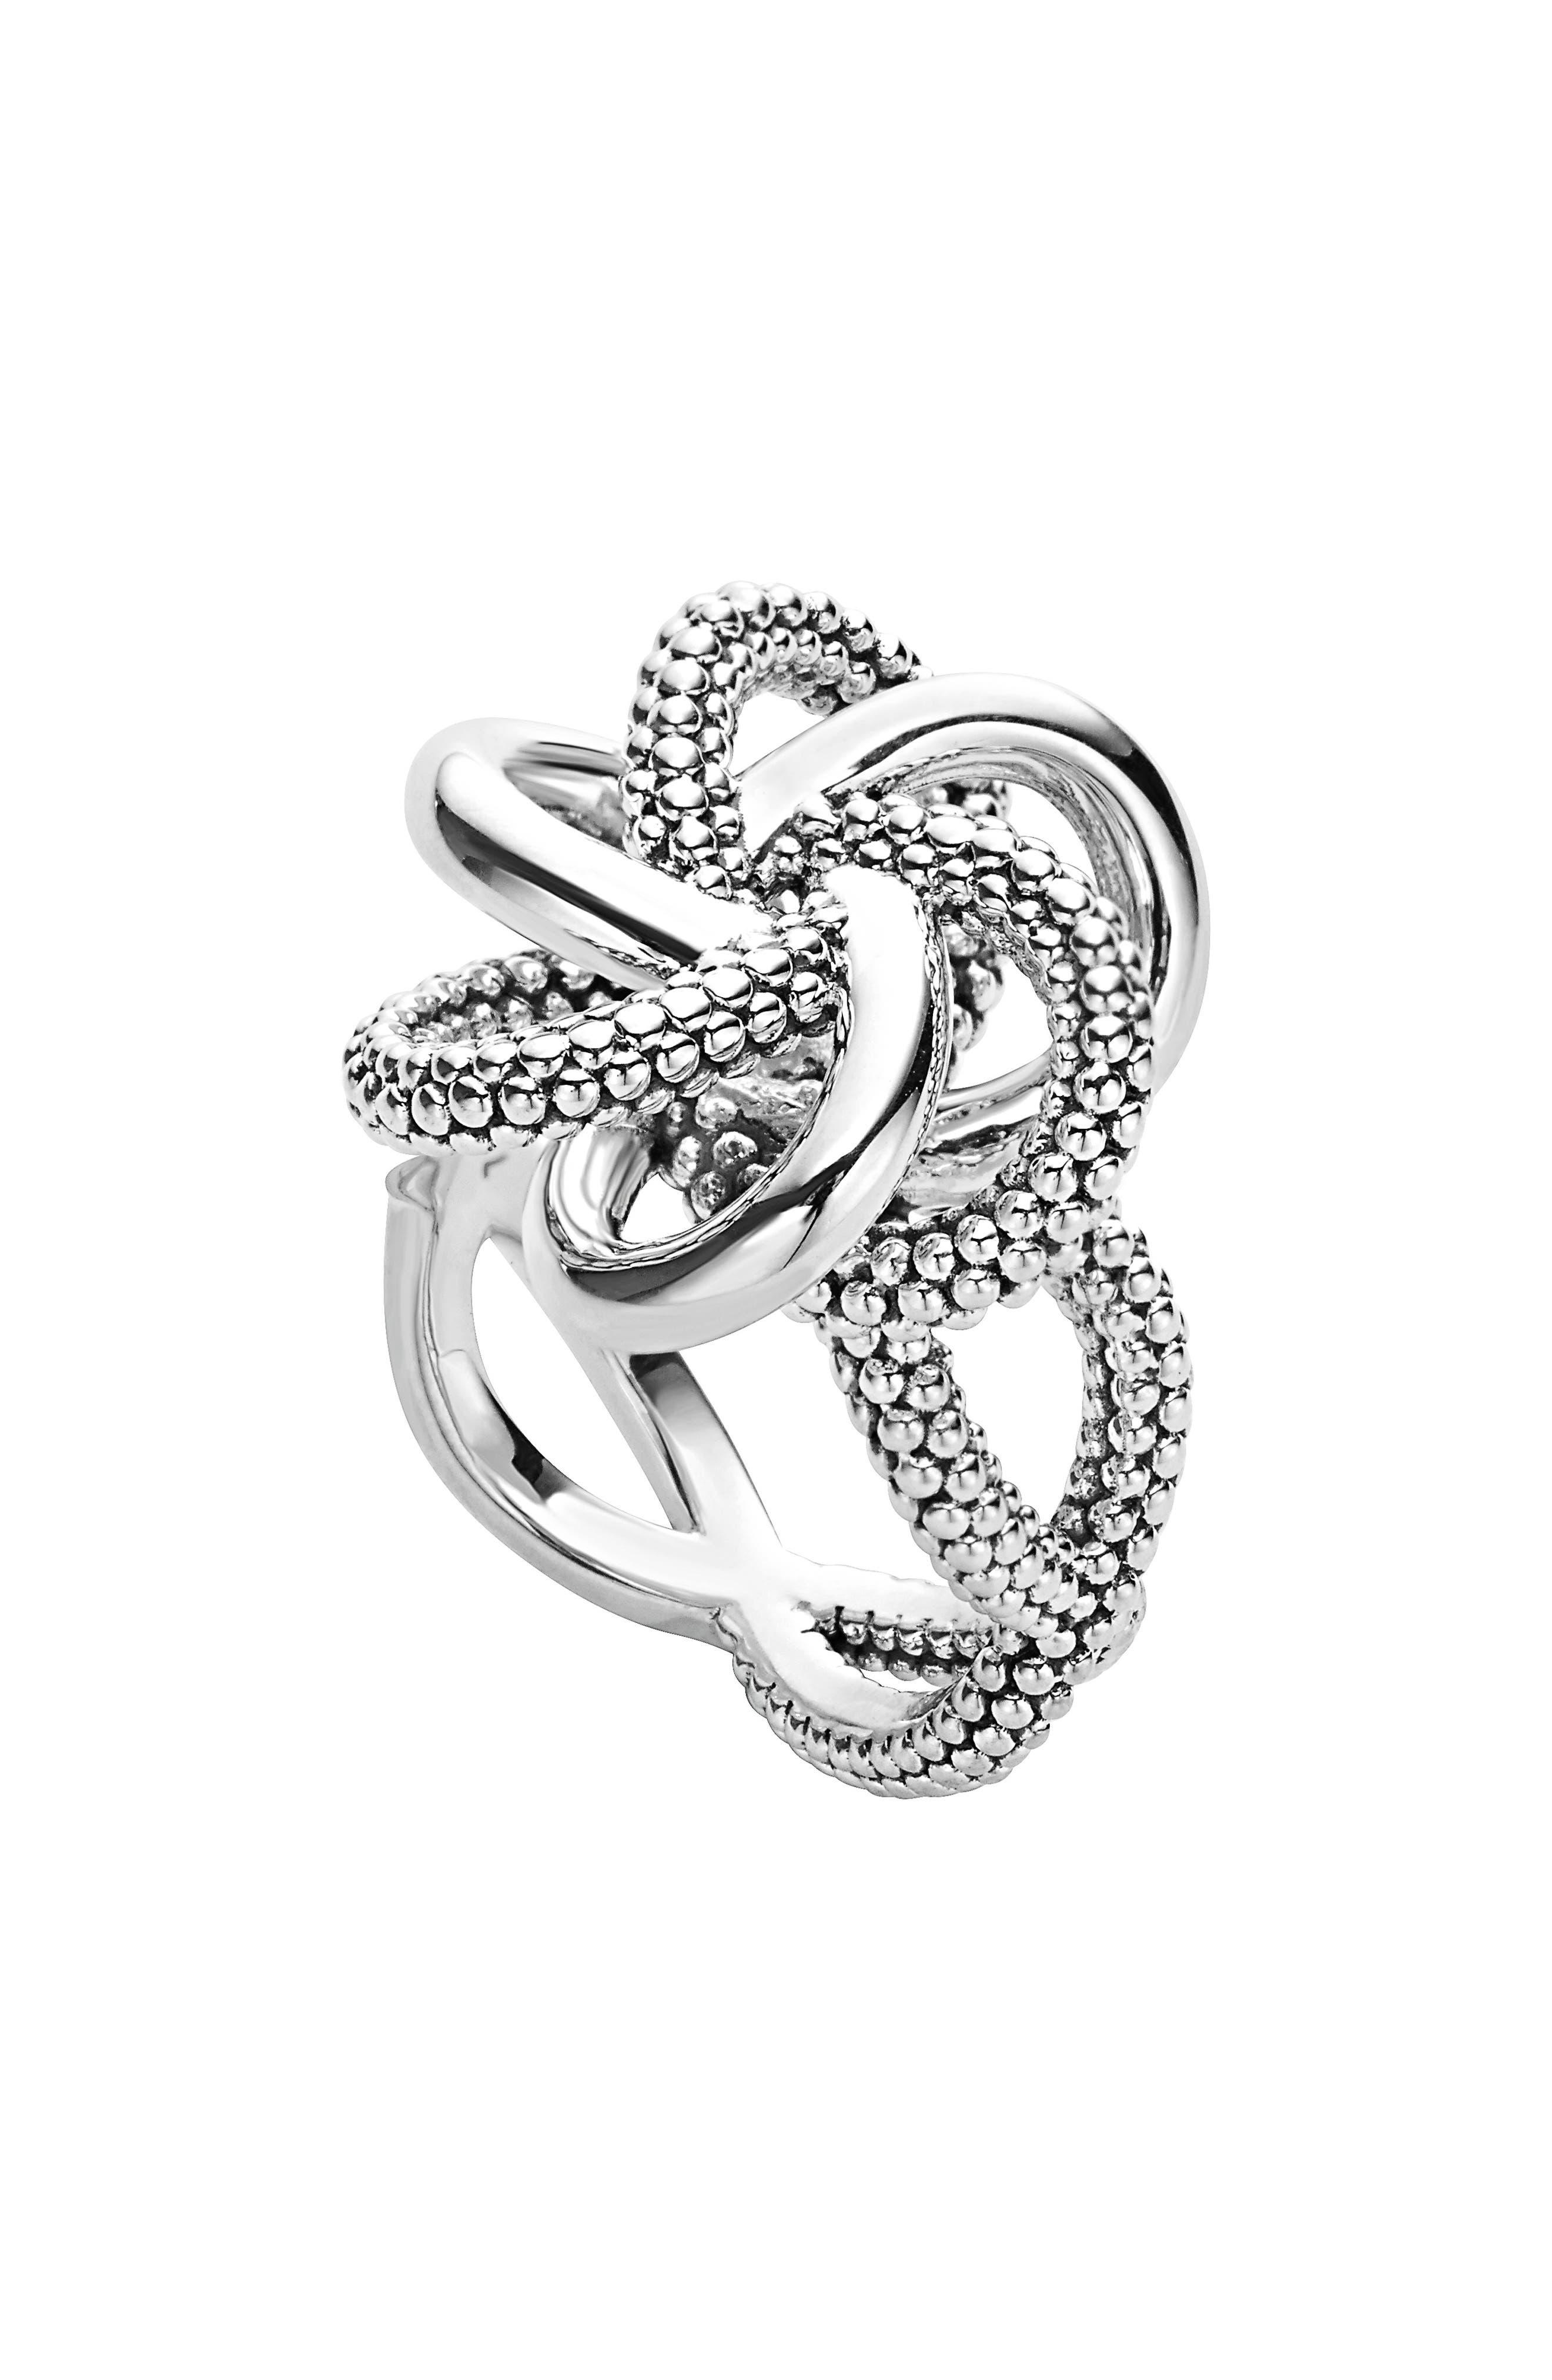 Main Image - LAGOS 'Love Knot' Twist Ring